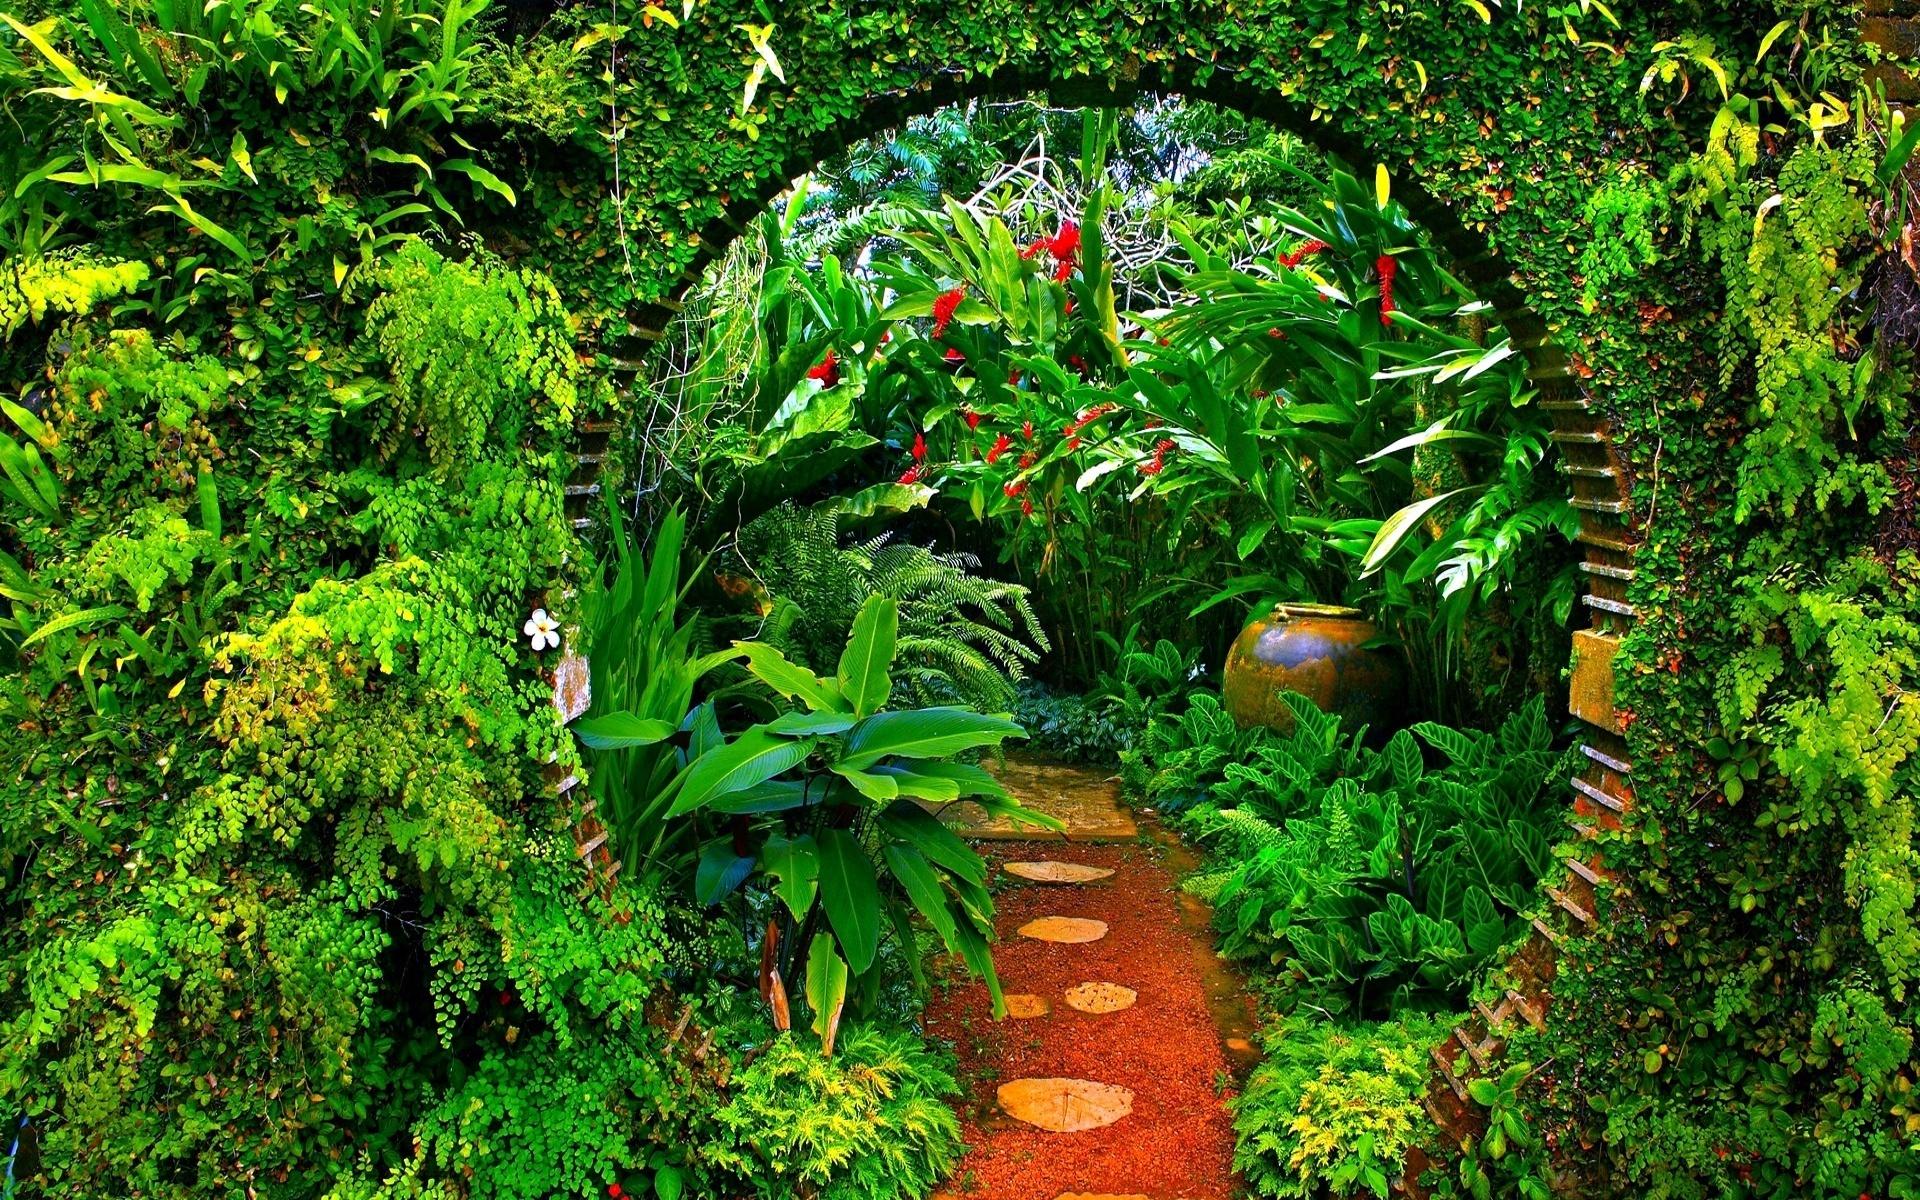 Wallpaper download garden - Wallpaper Download Garden 38